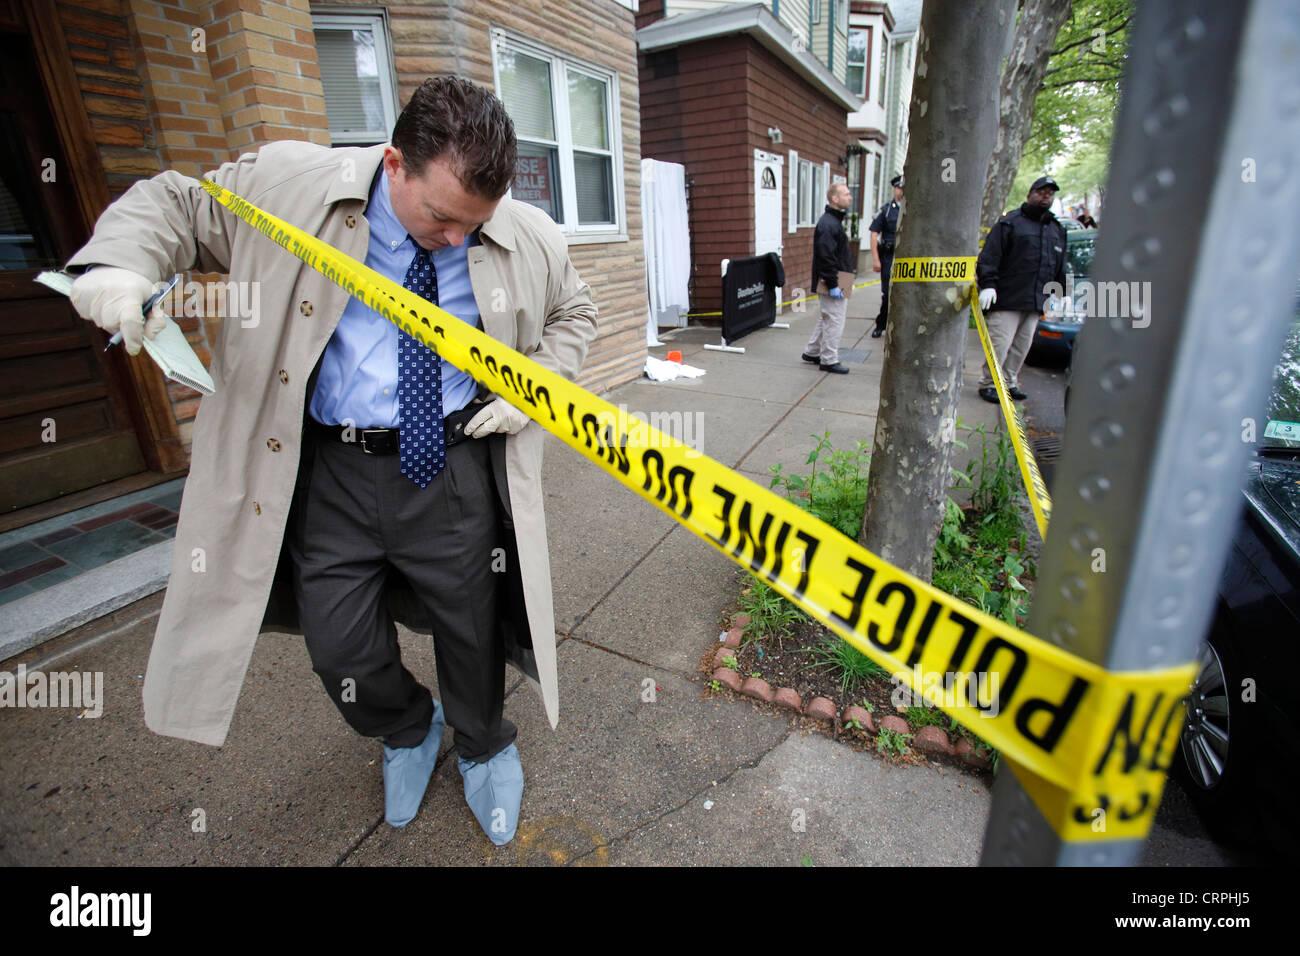 A police detective leaves a crime scene, Boston, Massachusetts - Stock Image